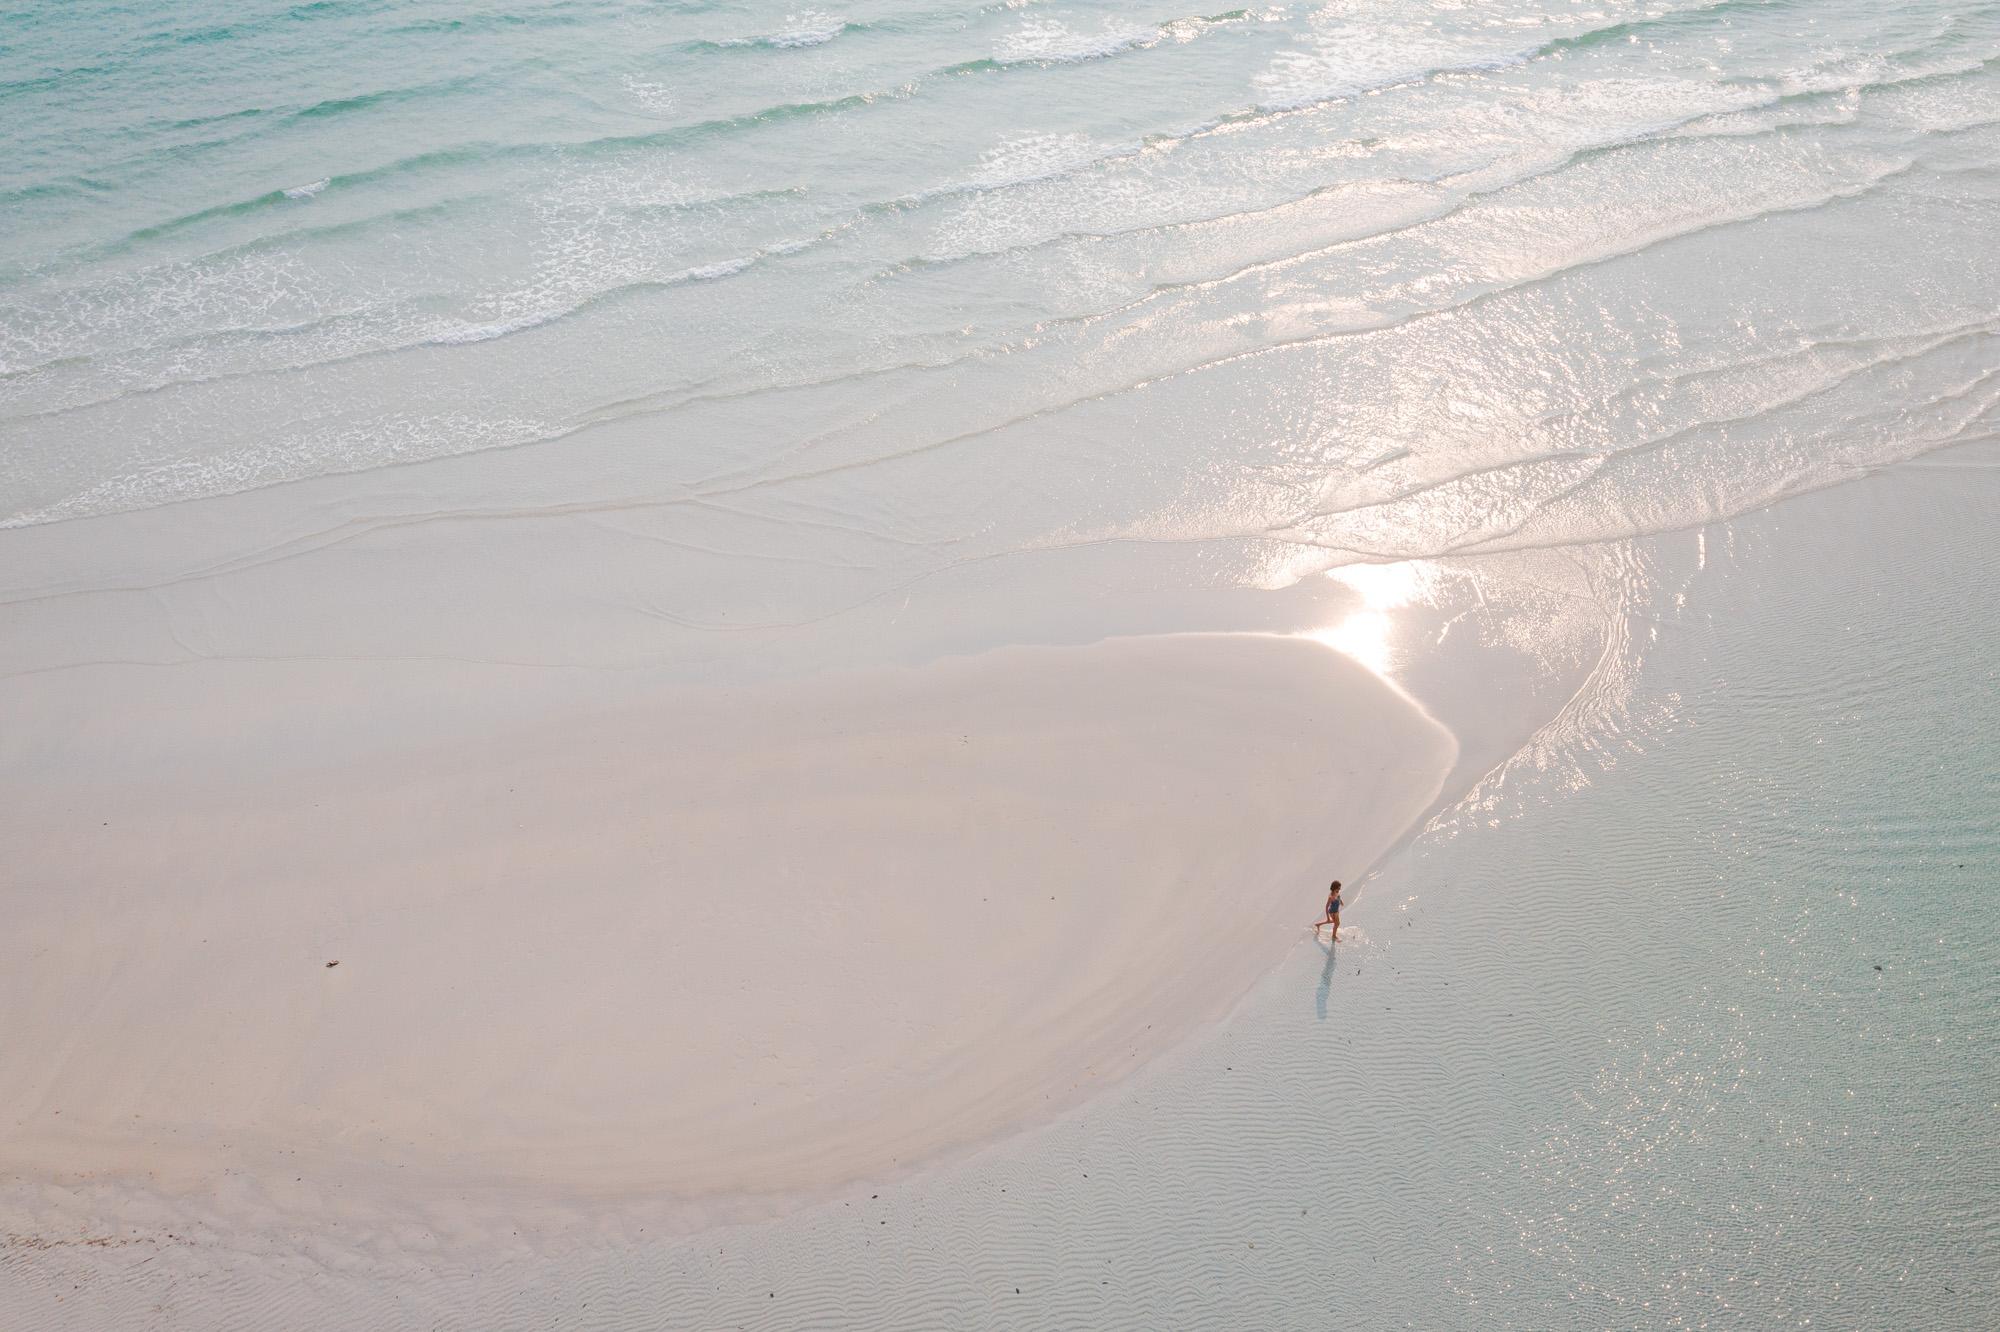 Strandbilder mit der Drohne: DJI Mavic 2 Pro im Urlaub